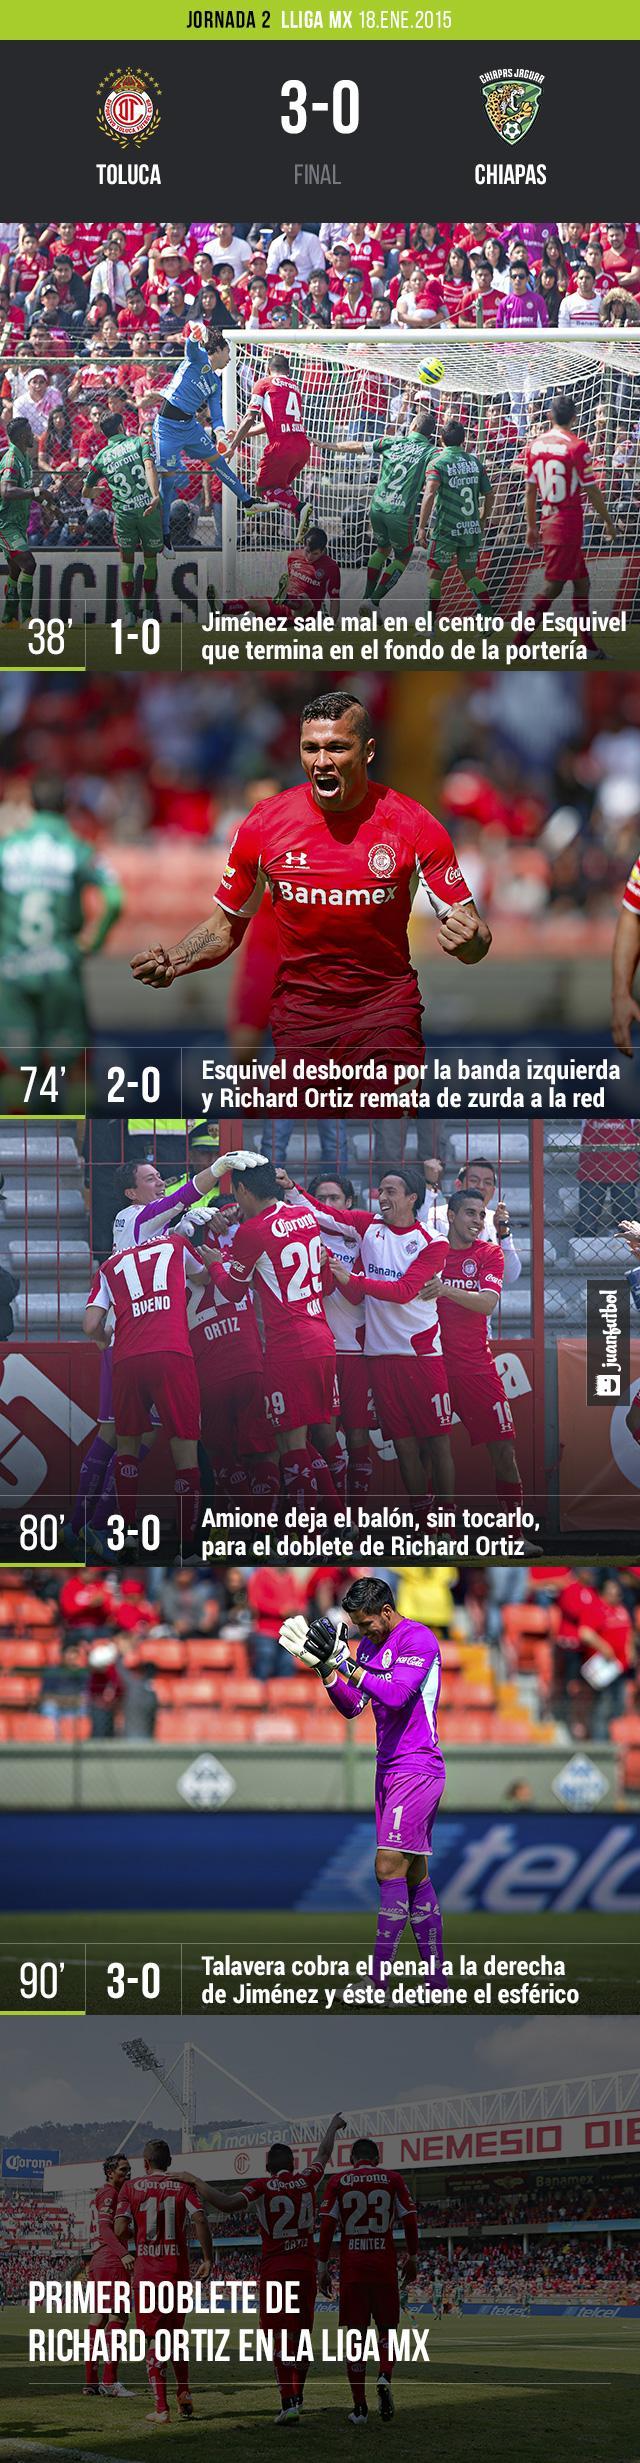 Toluca vence 3-0 a los Jaguares de Chiapas en el Nemesio Díez